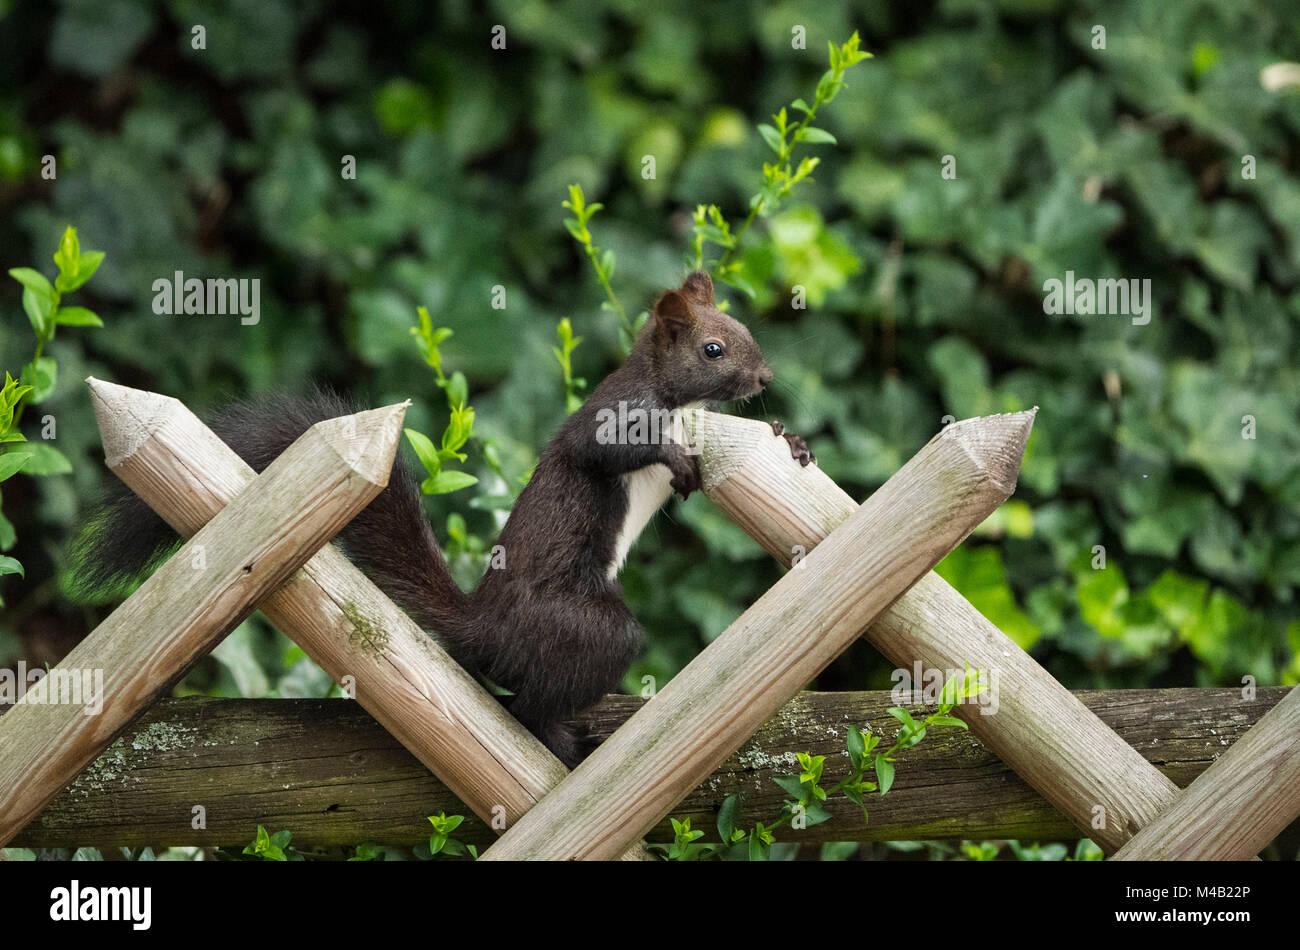 Squirrels (Sciurus vulgaris),melanistic animal,red squirrel, rustic fence,Stuttgart,Baden-Wurttemberg,Germany - Stock Image